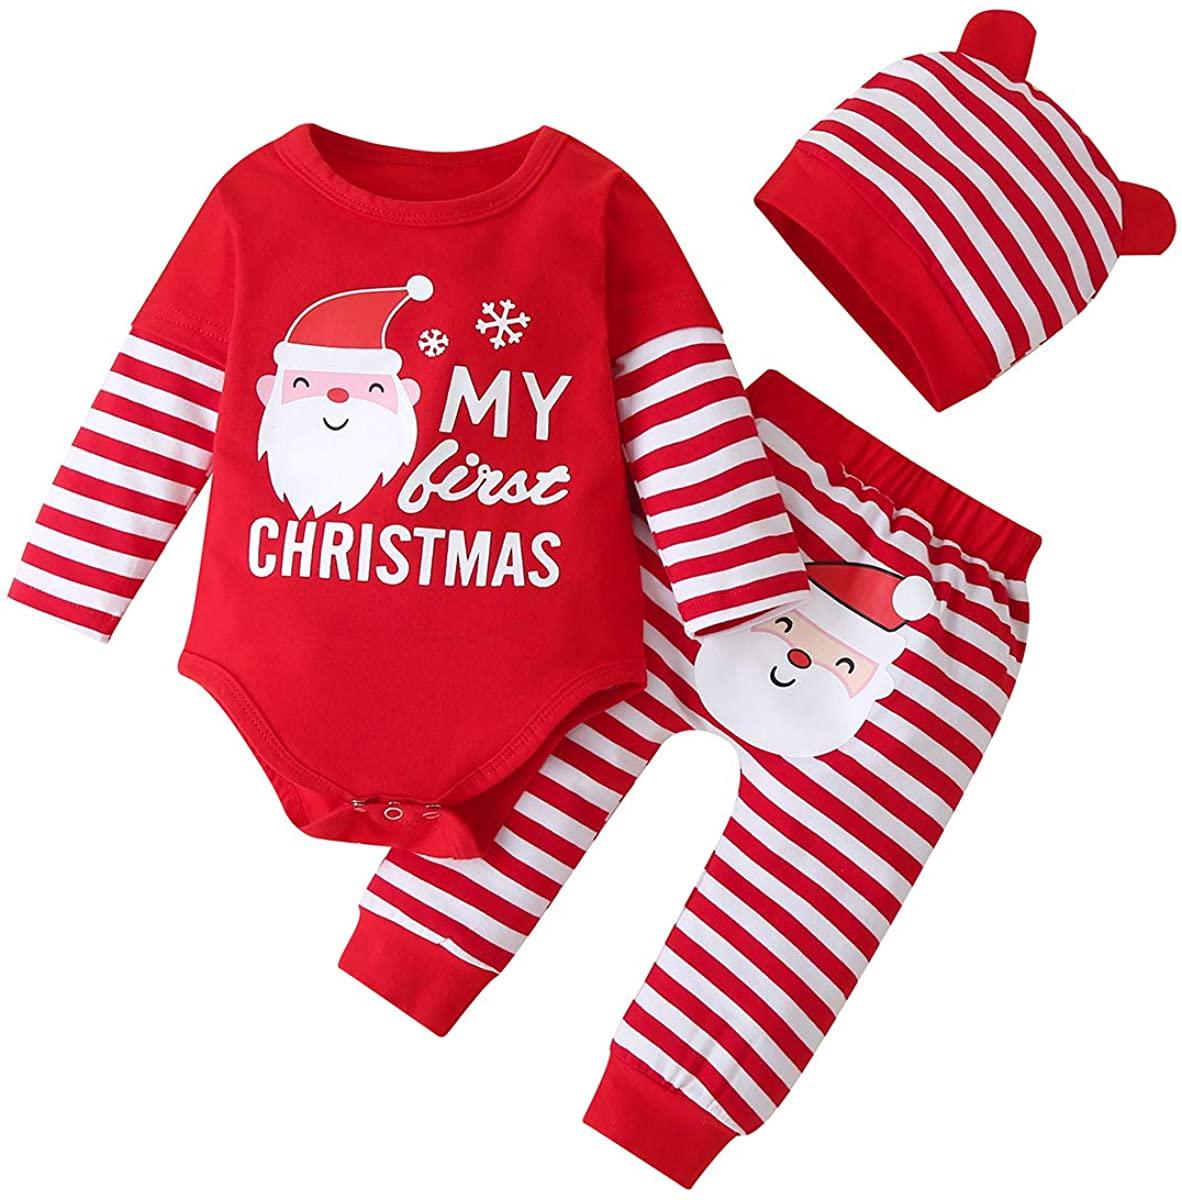 Newborn Infant Baby Boy Girl Christmas Clothes My 1st Christmas Romper + Stripe Pants + Hat 3pcs Outfit Set